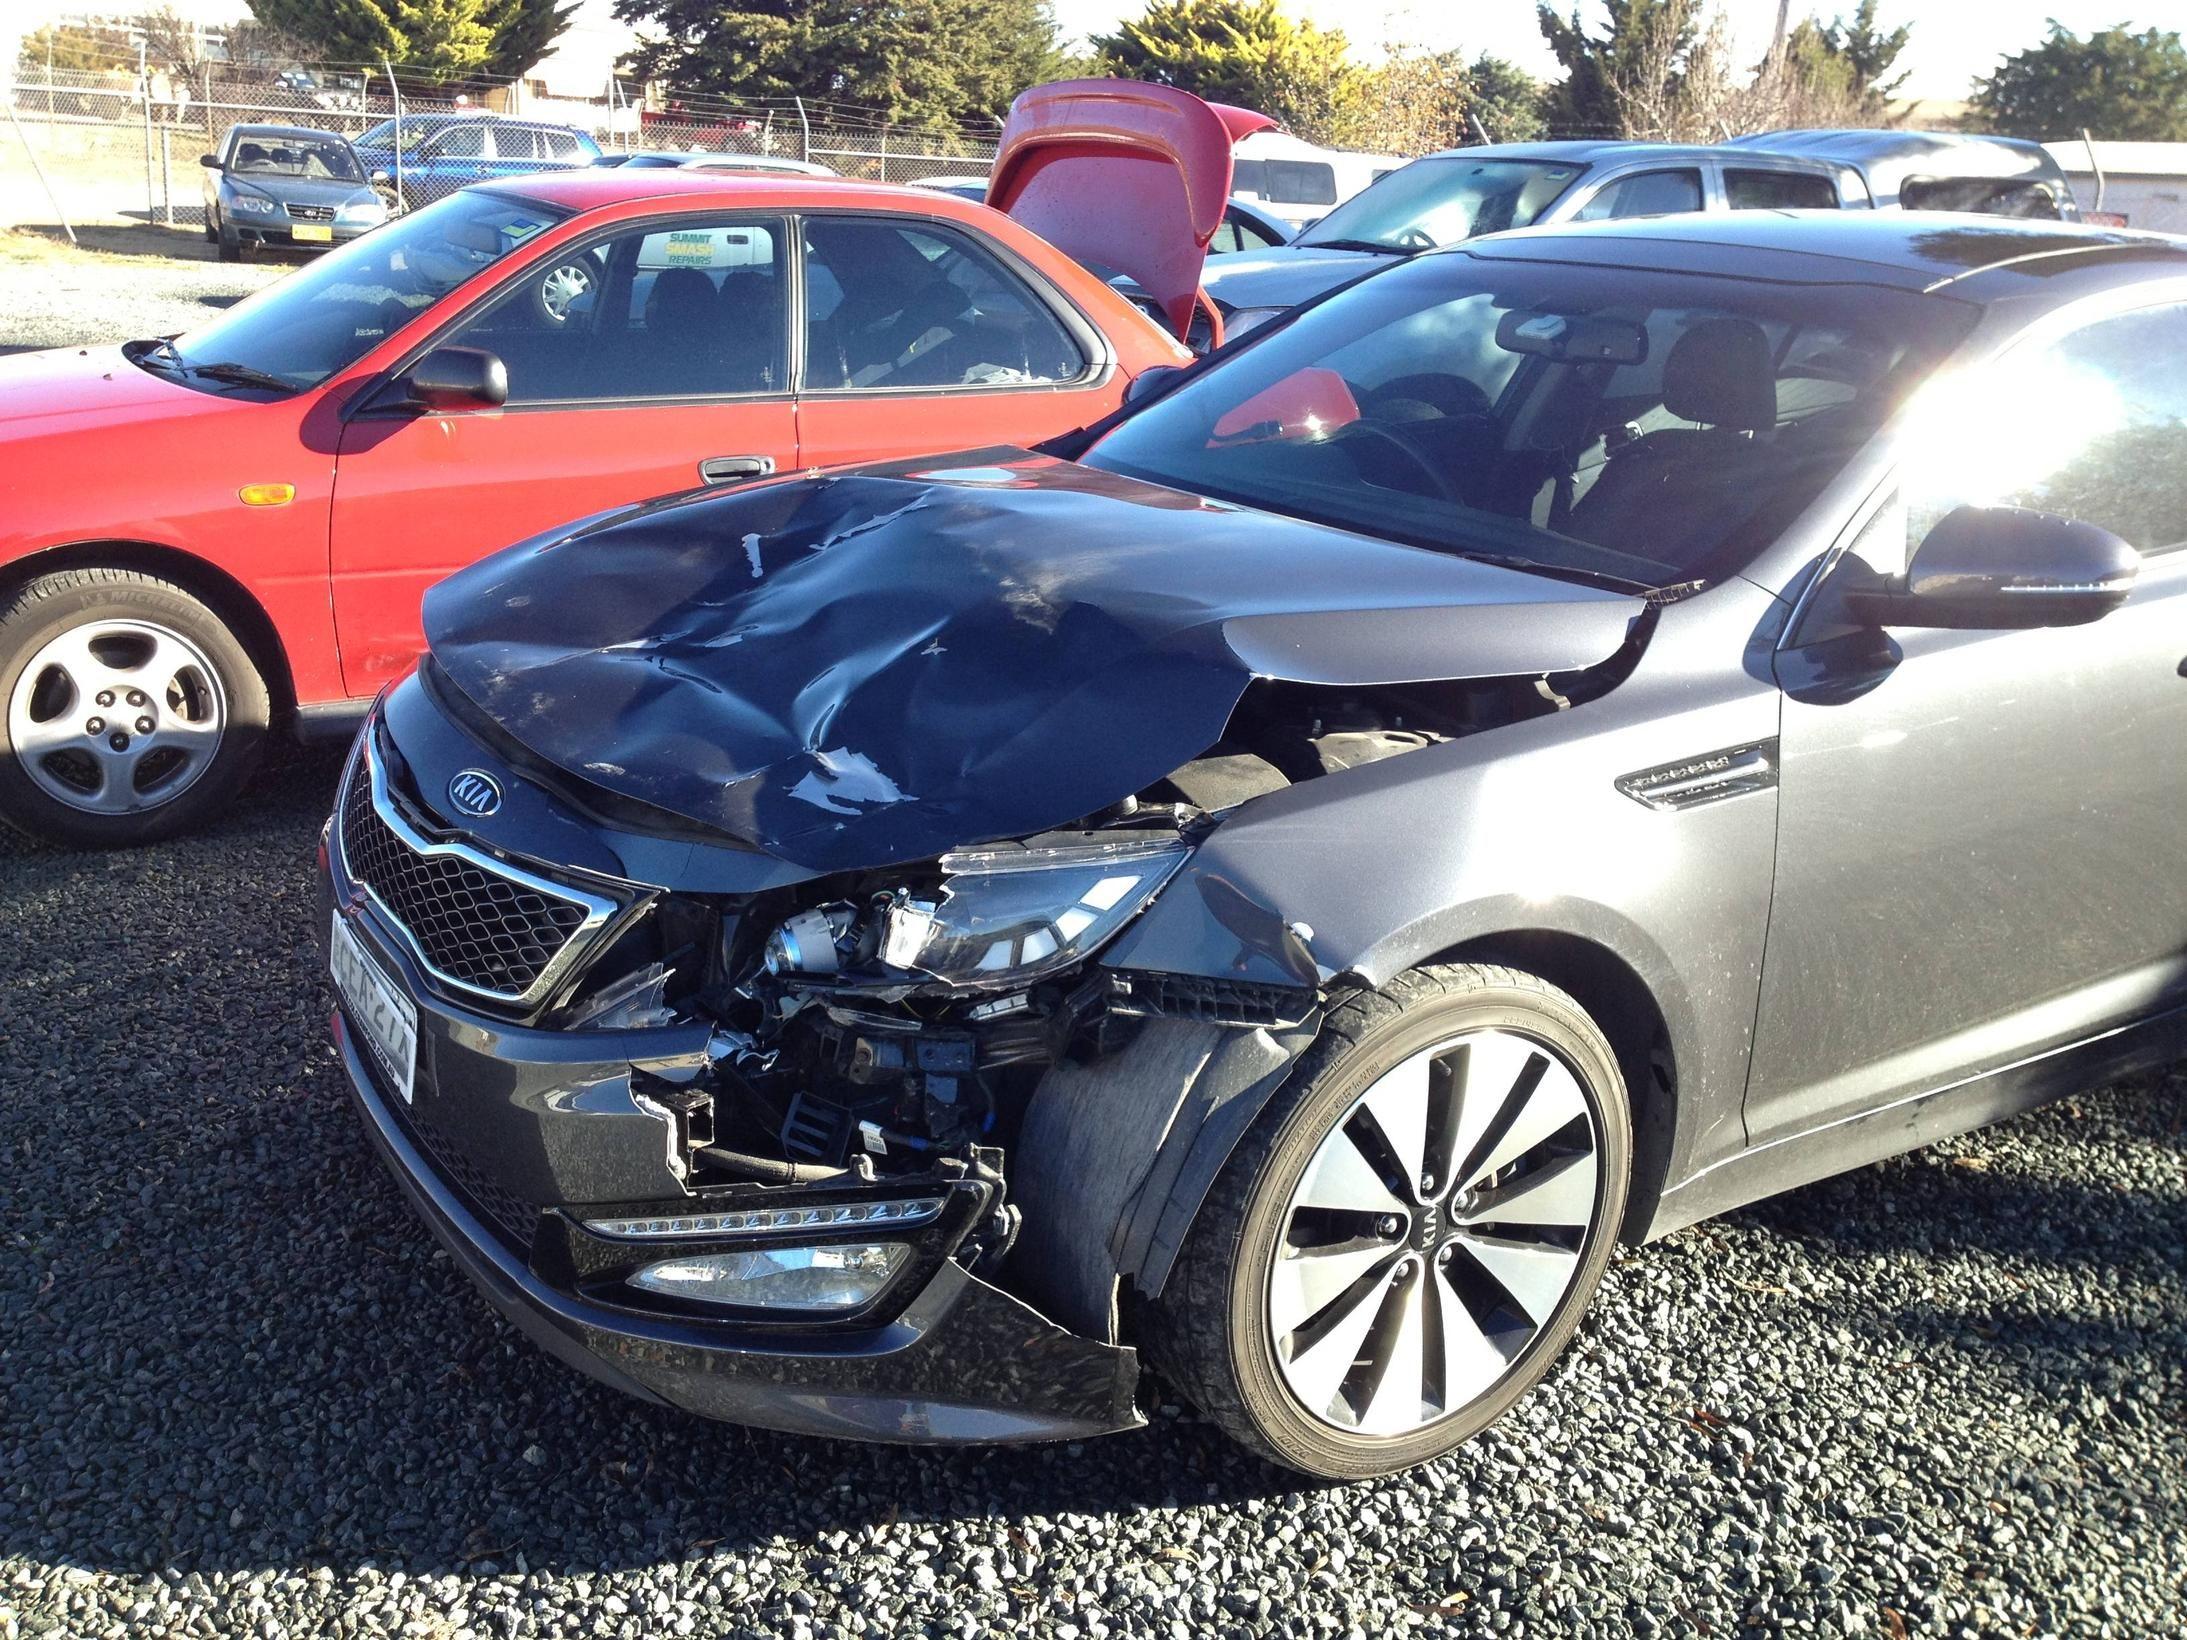 kangaroo damage to car - Kangaroos have been a big problem this year, this is